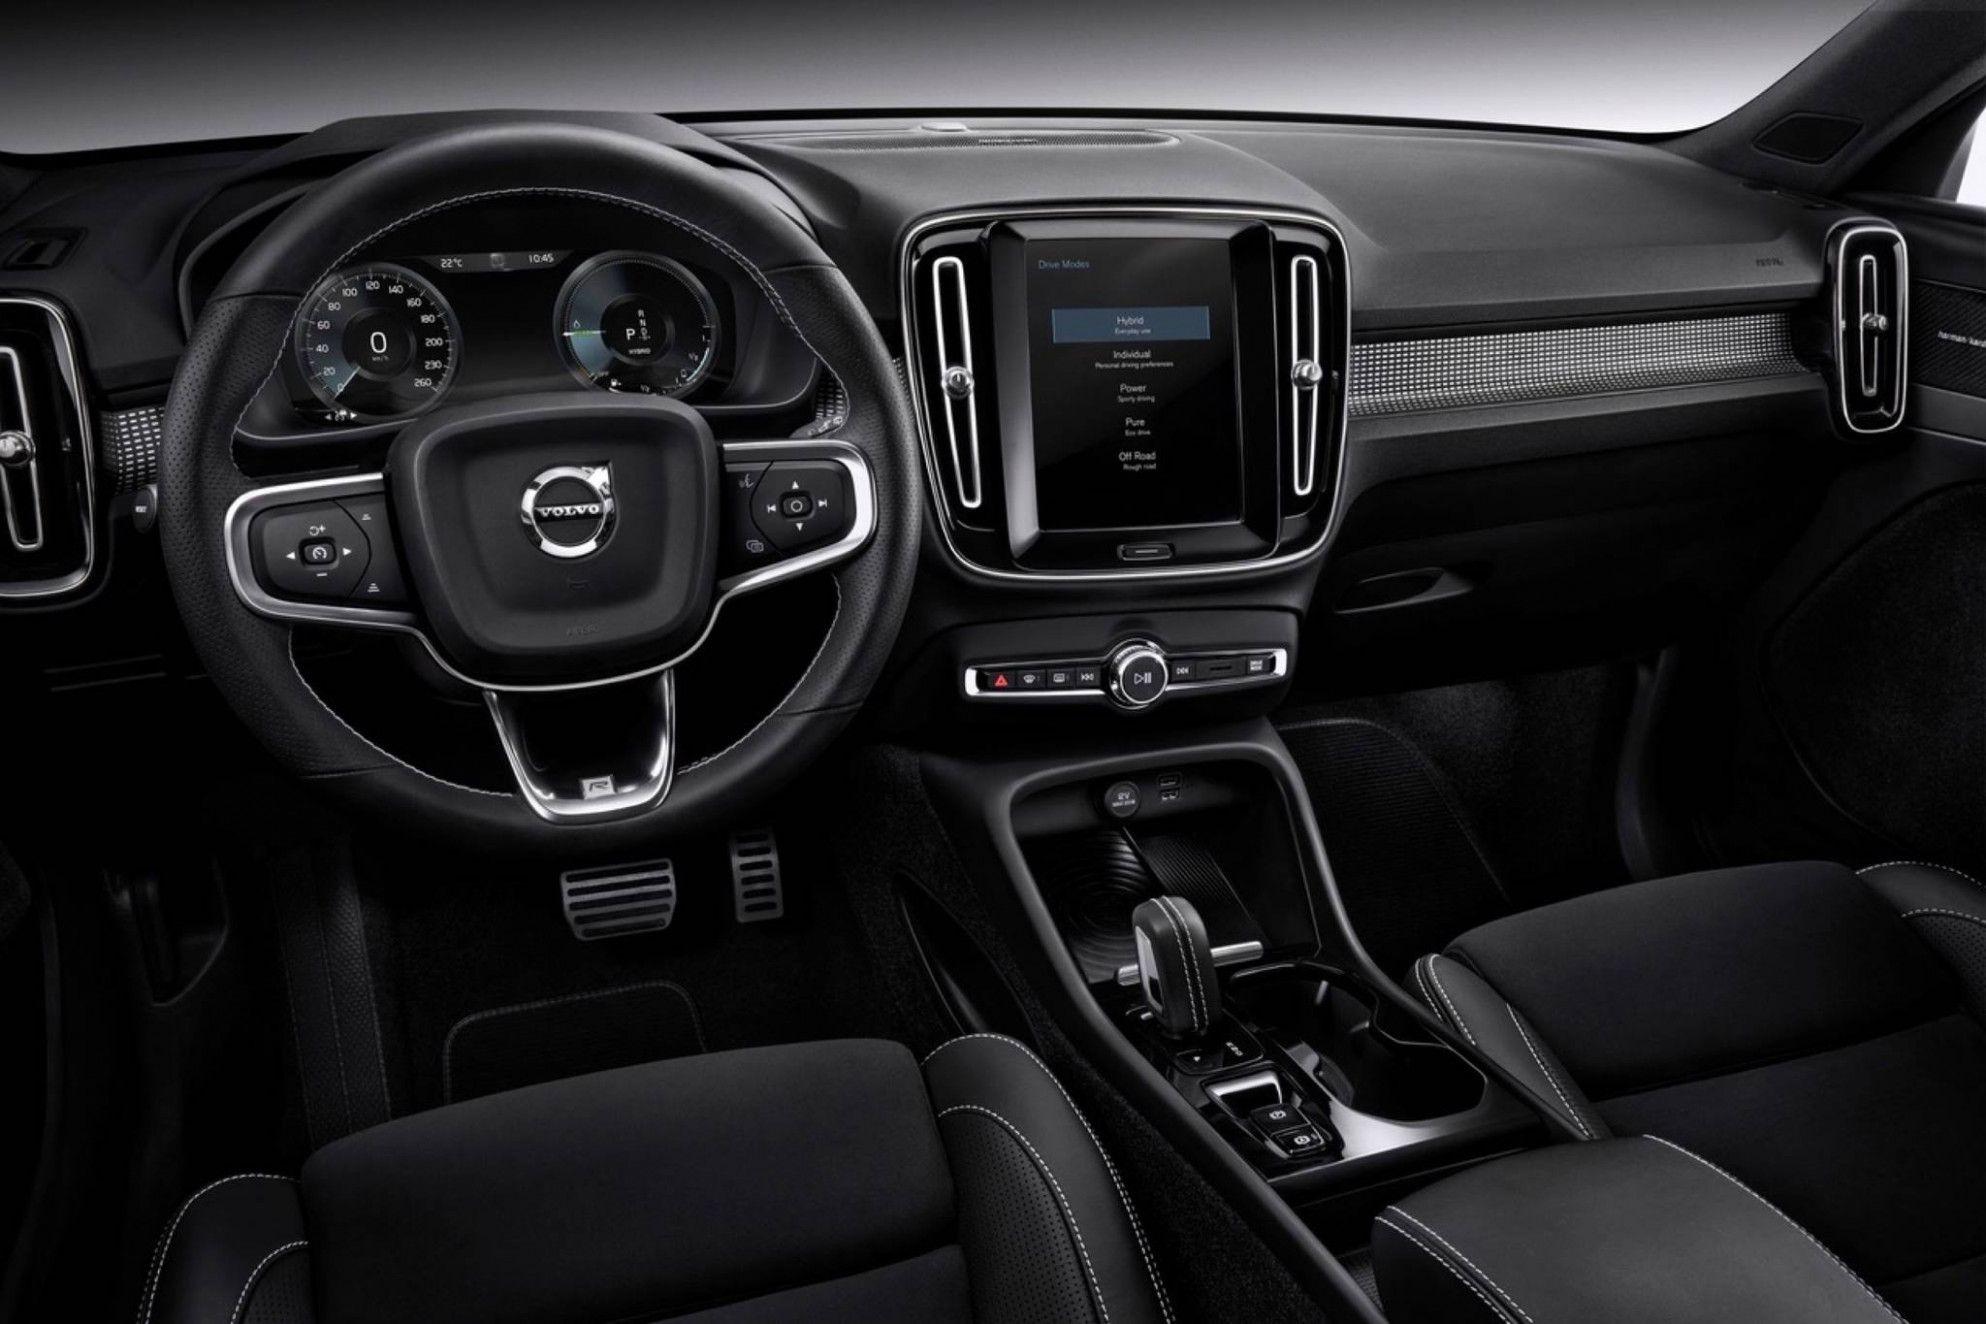 7 Wallpaper 2020 Volvo Xc40 Interior In 2020 Volvo Volvo Xc60 Volvo Xc